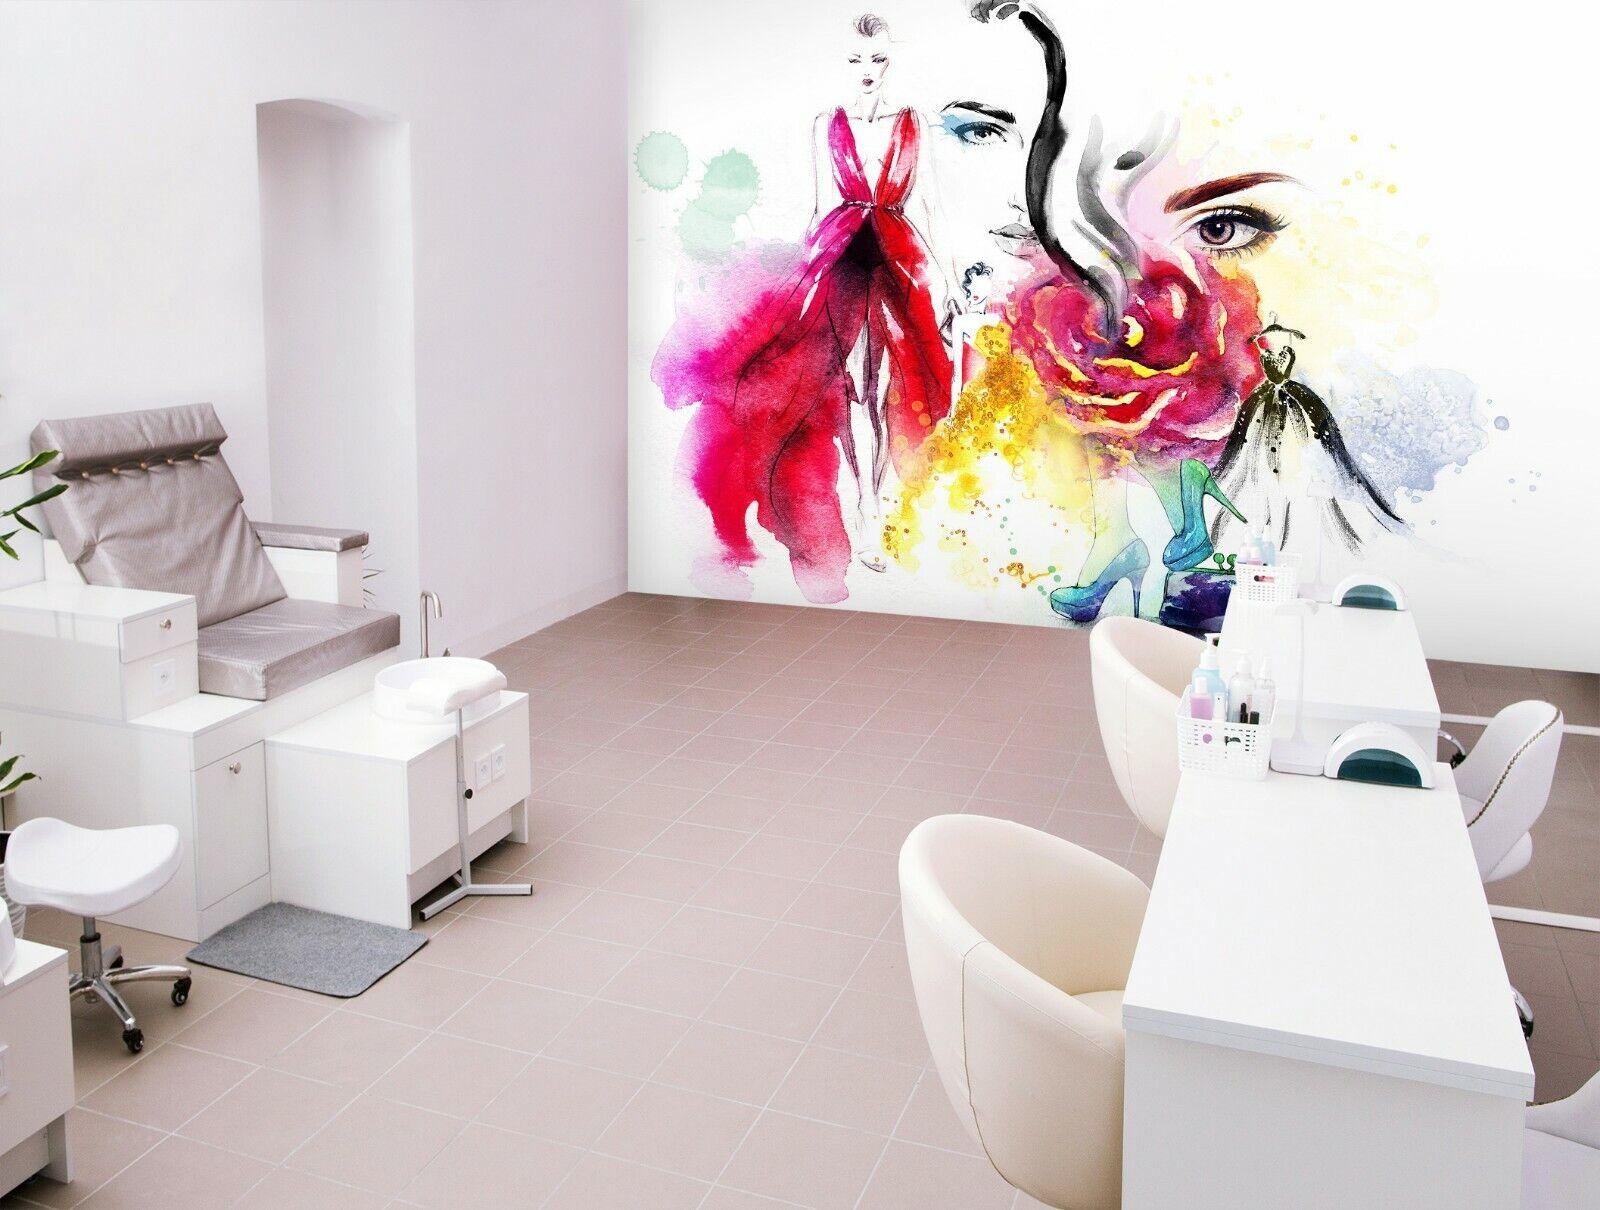 3D Graffiti-Mädchen M53 Geschäft Tapete Wandgemälde Selbstklebend Handel An